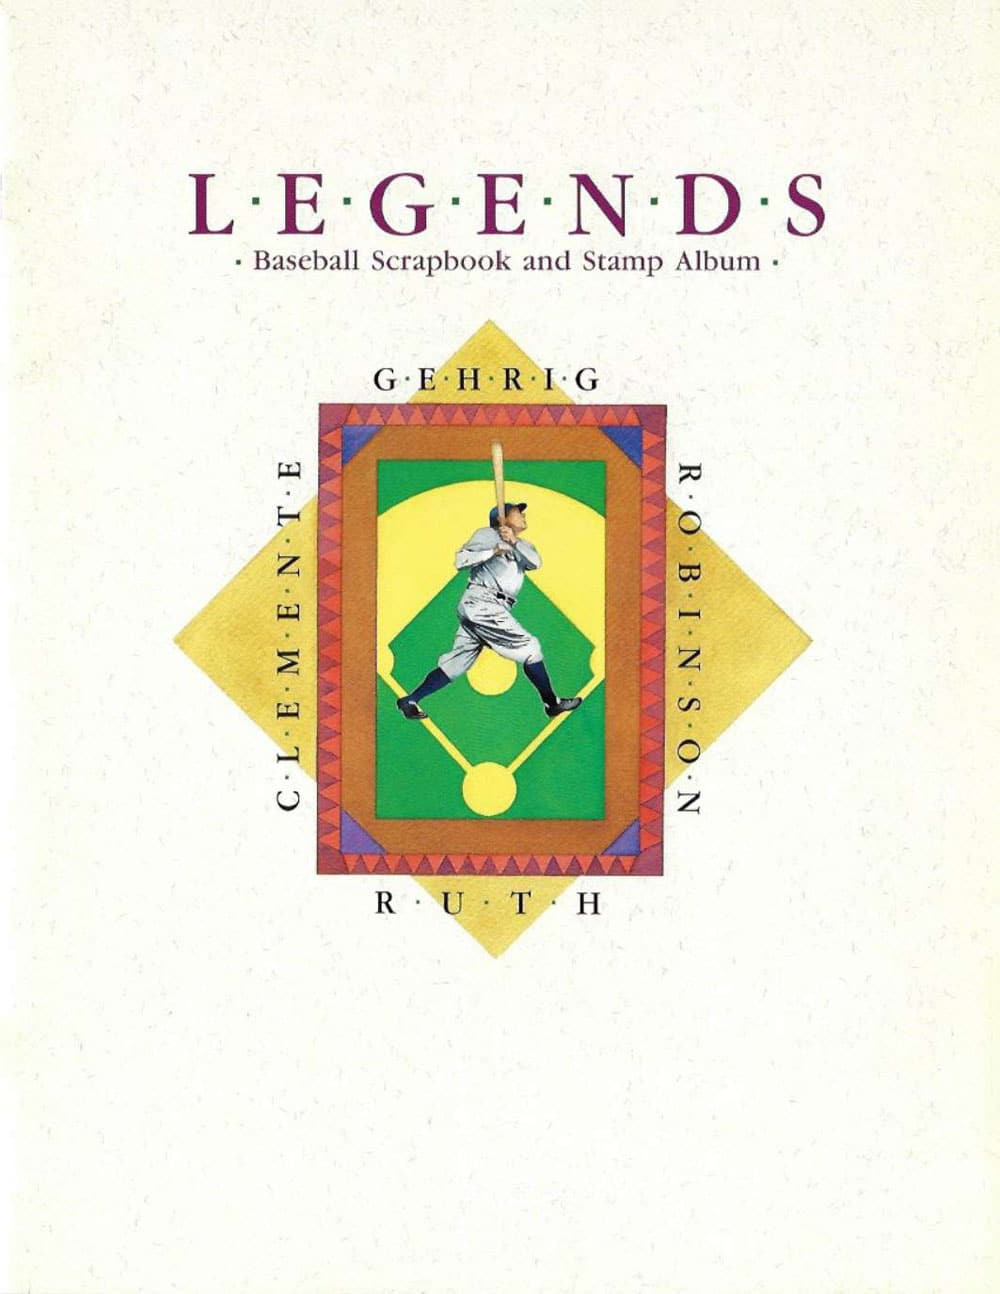 Legends – Baseball Scrapbook and Stamp Album